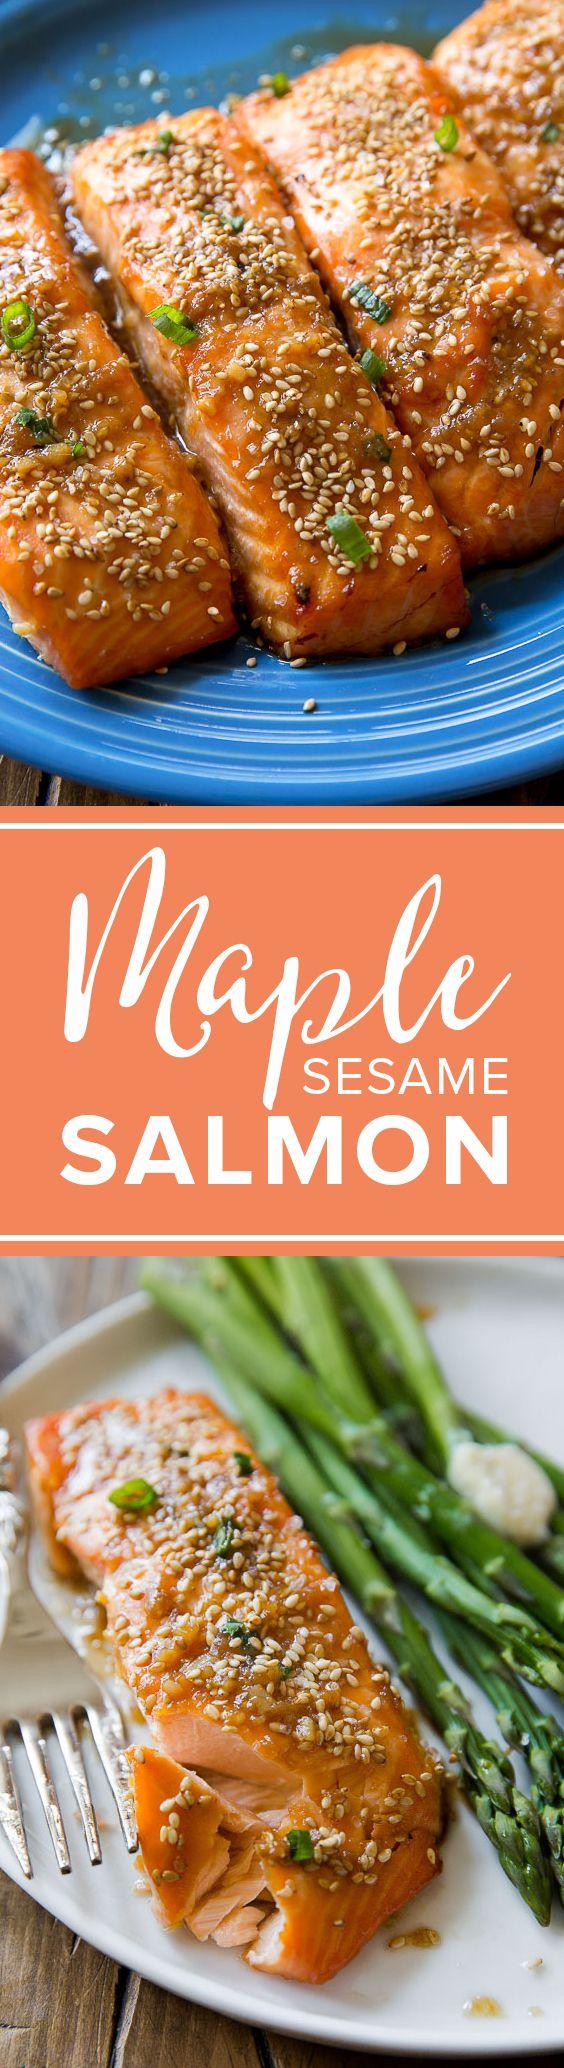 Super easy healthy weeknight dinner is baked maple sesame glazed salmon! Healthy recipe http://sallysbakingaddiction.com/2016/04/15/easy-maple-sesame-salmon/